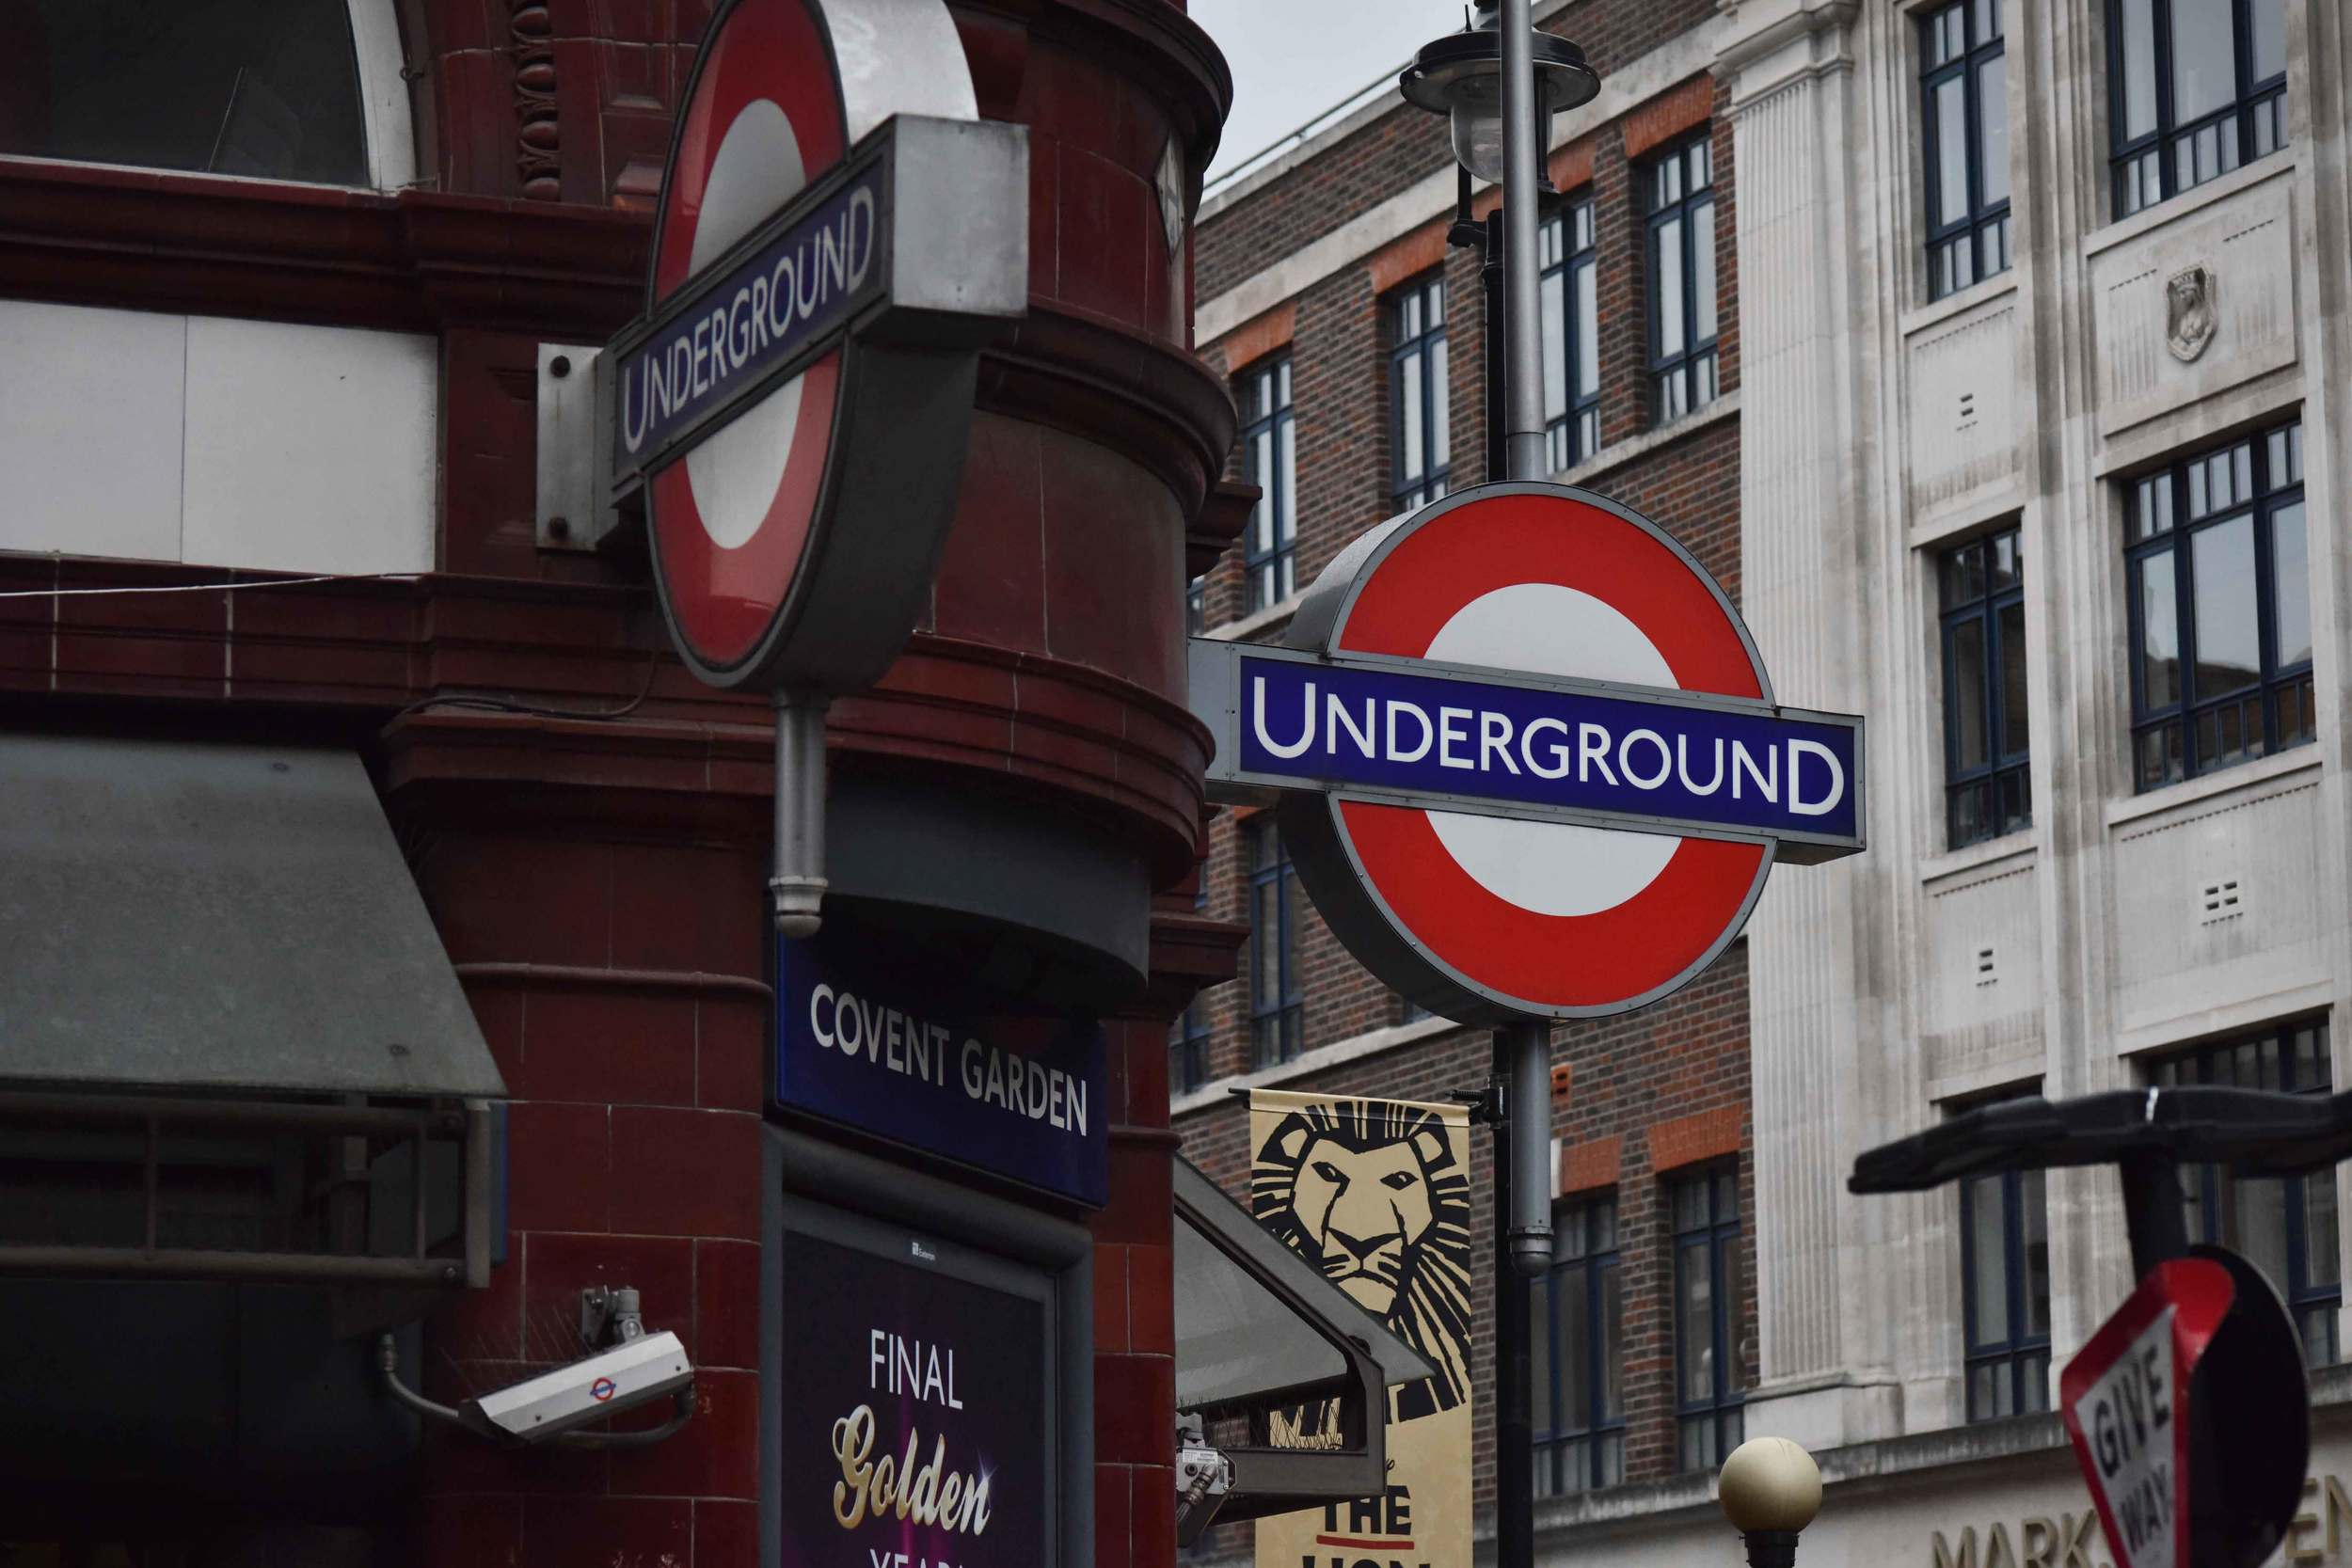 Covent Garden underground station, tube station, London, UK. Image©sourcingstyle.com